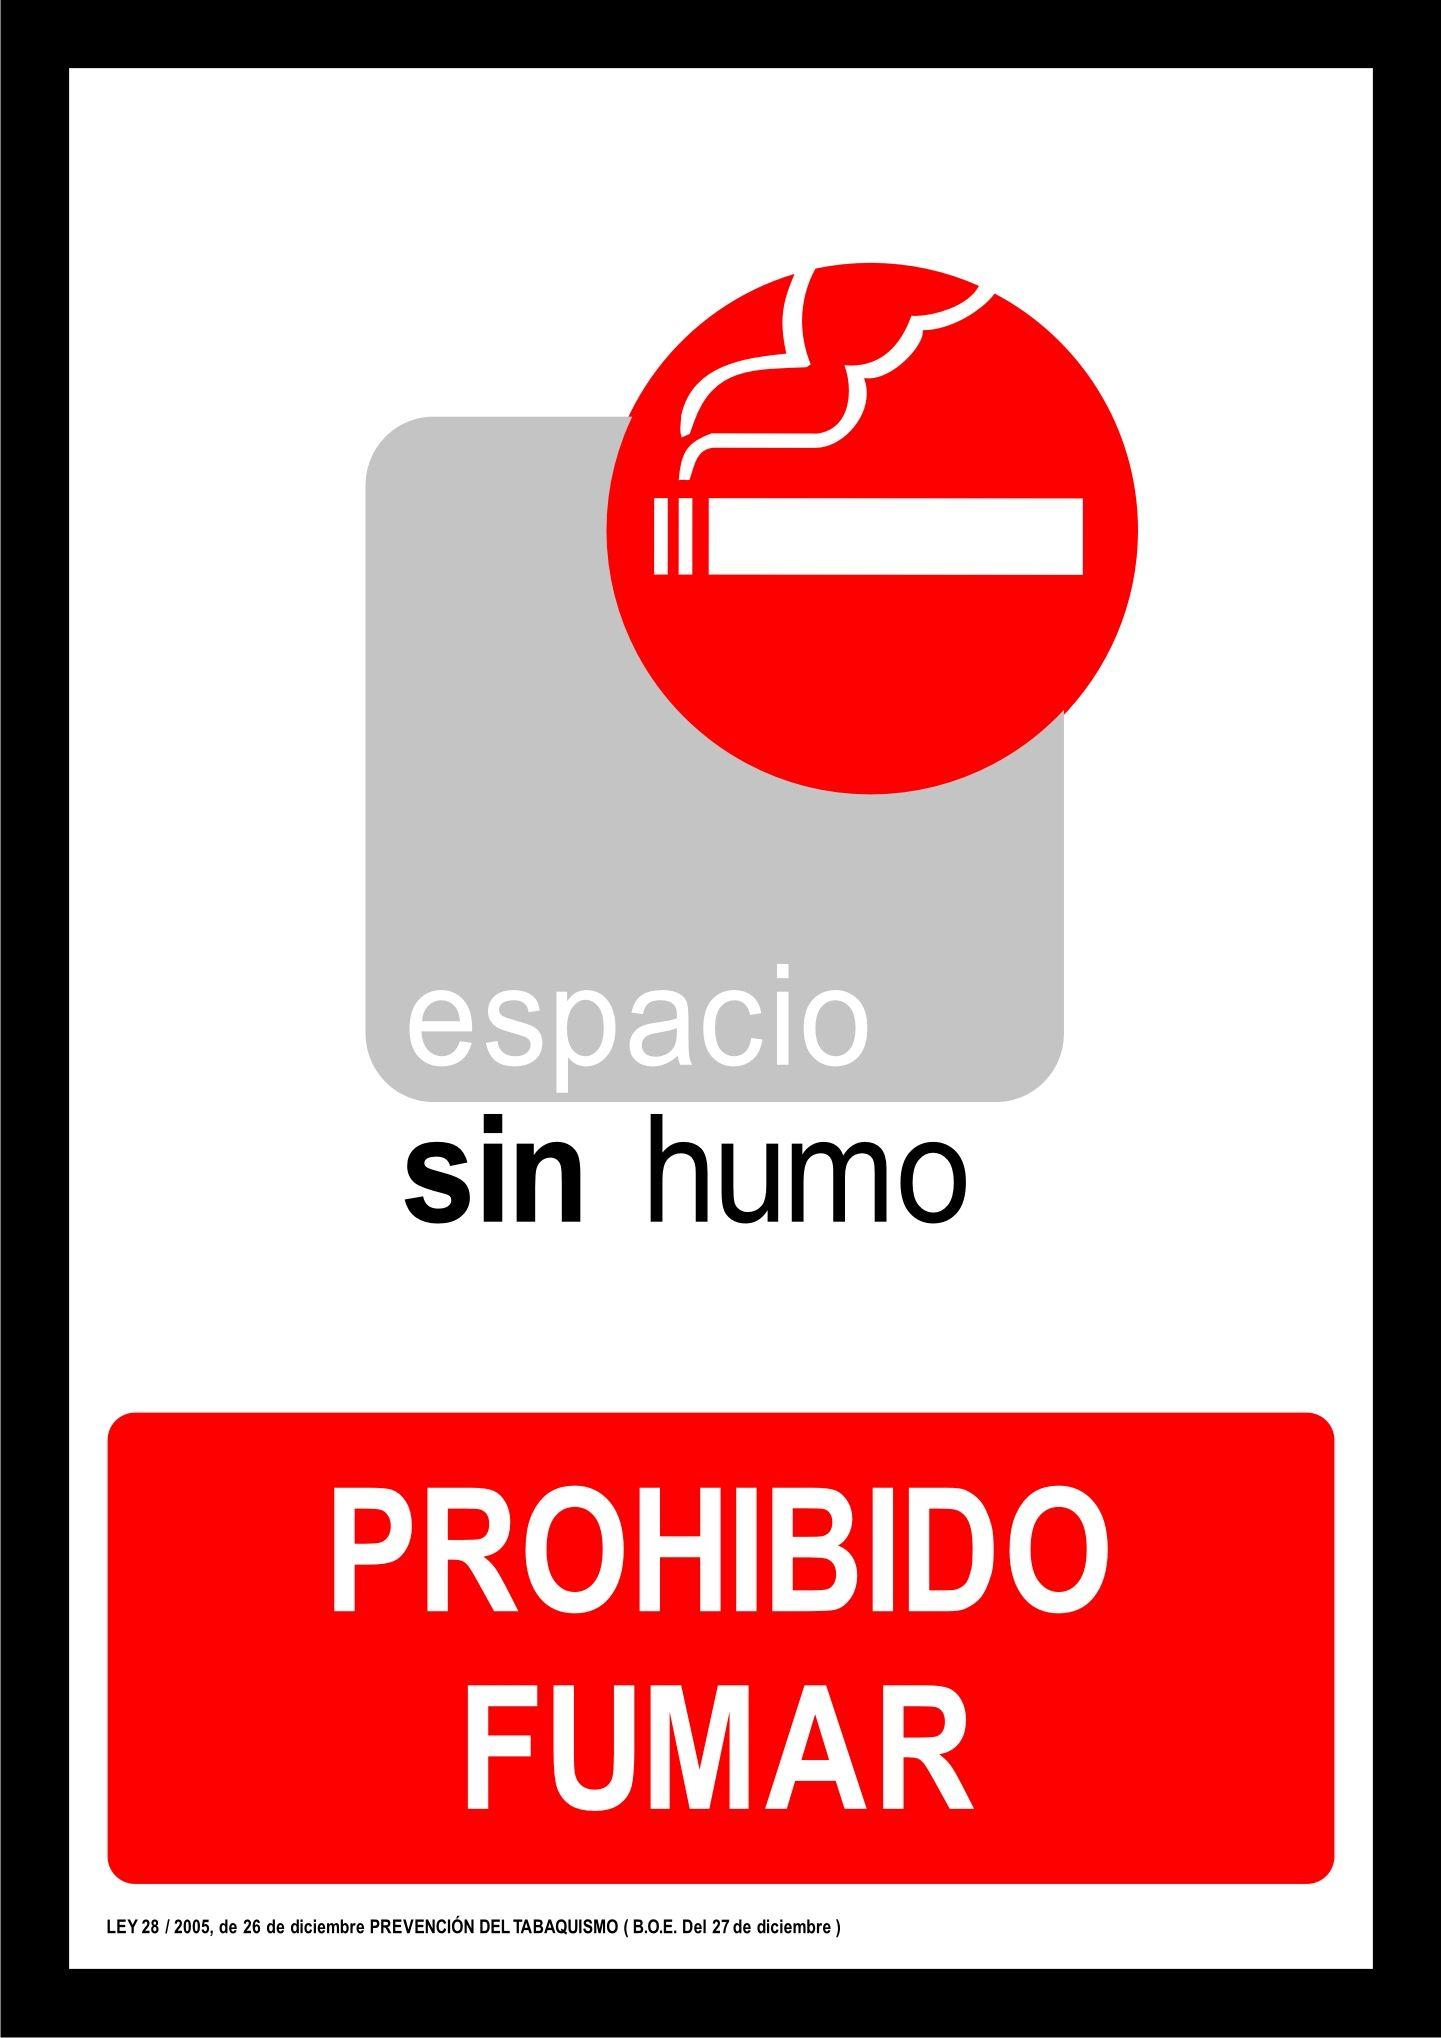 Señal espacio sin humo prohibido fumar | Icons | Pinterest | Icons